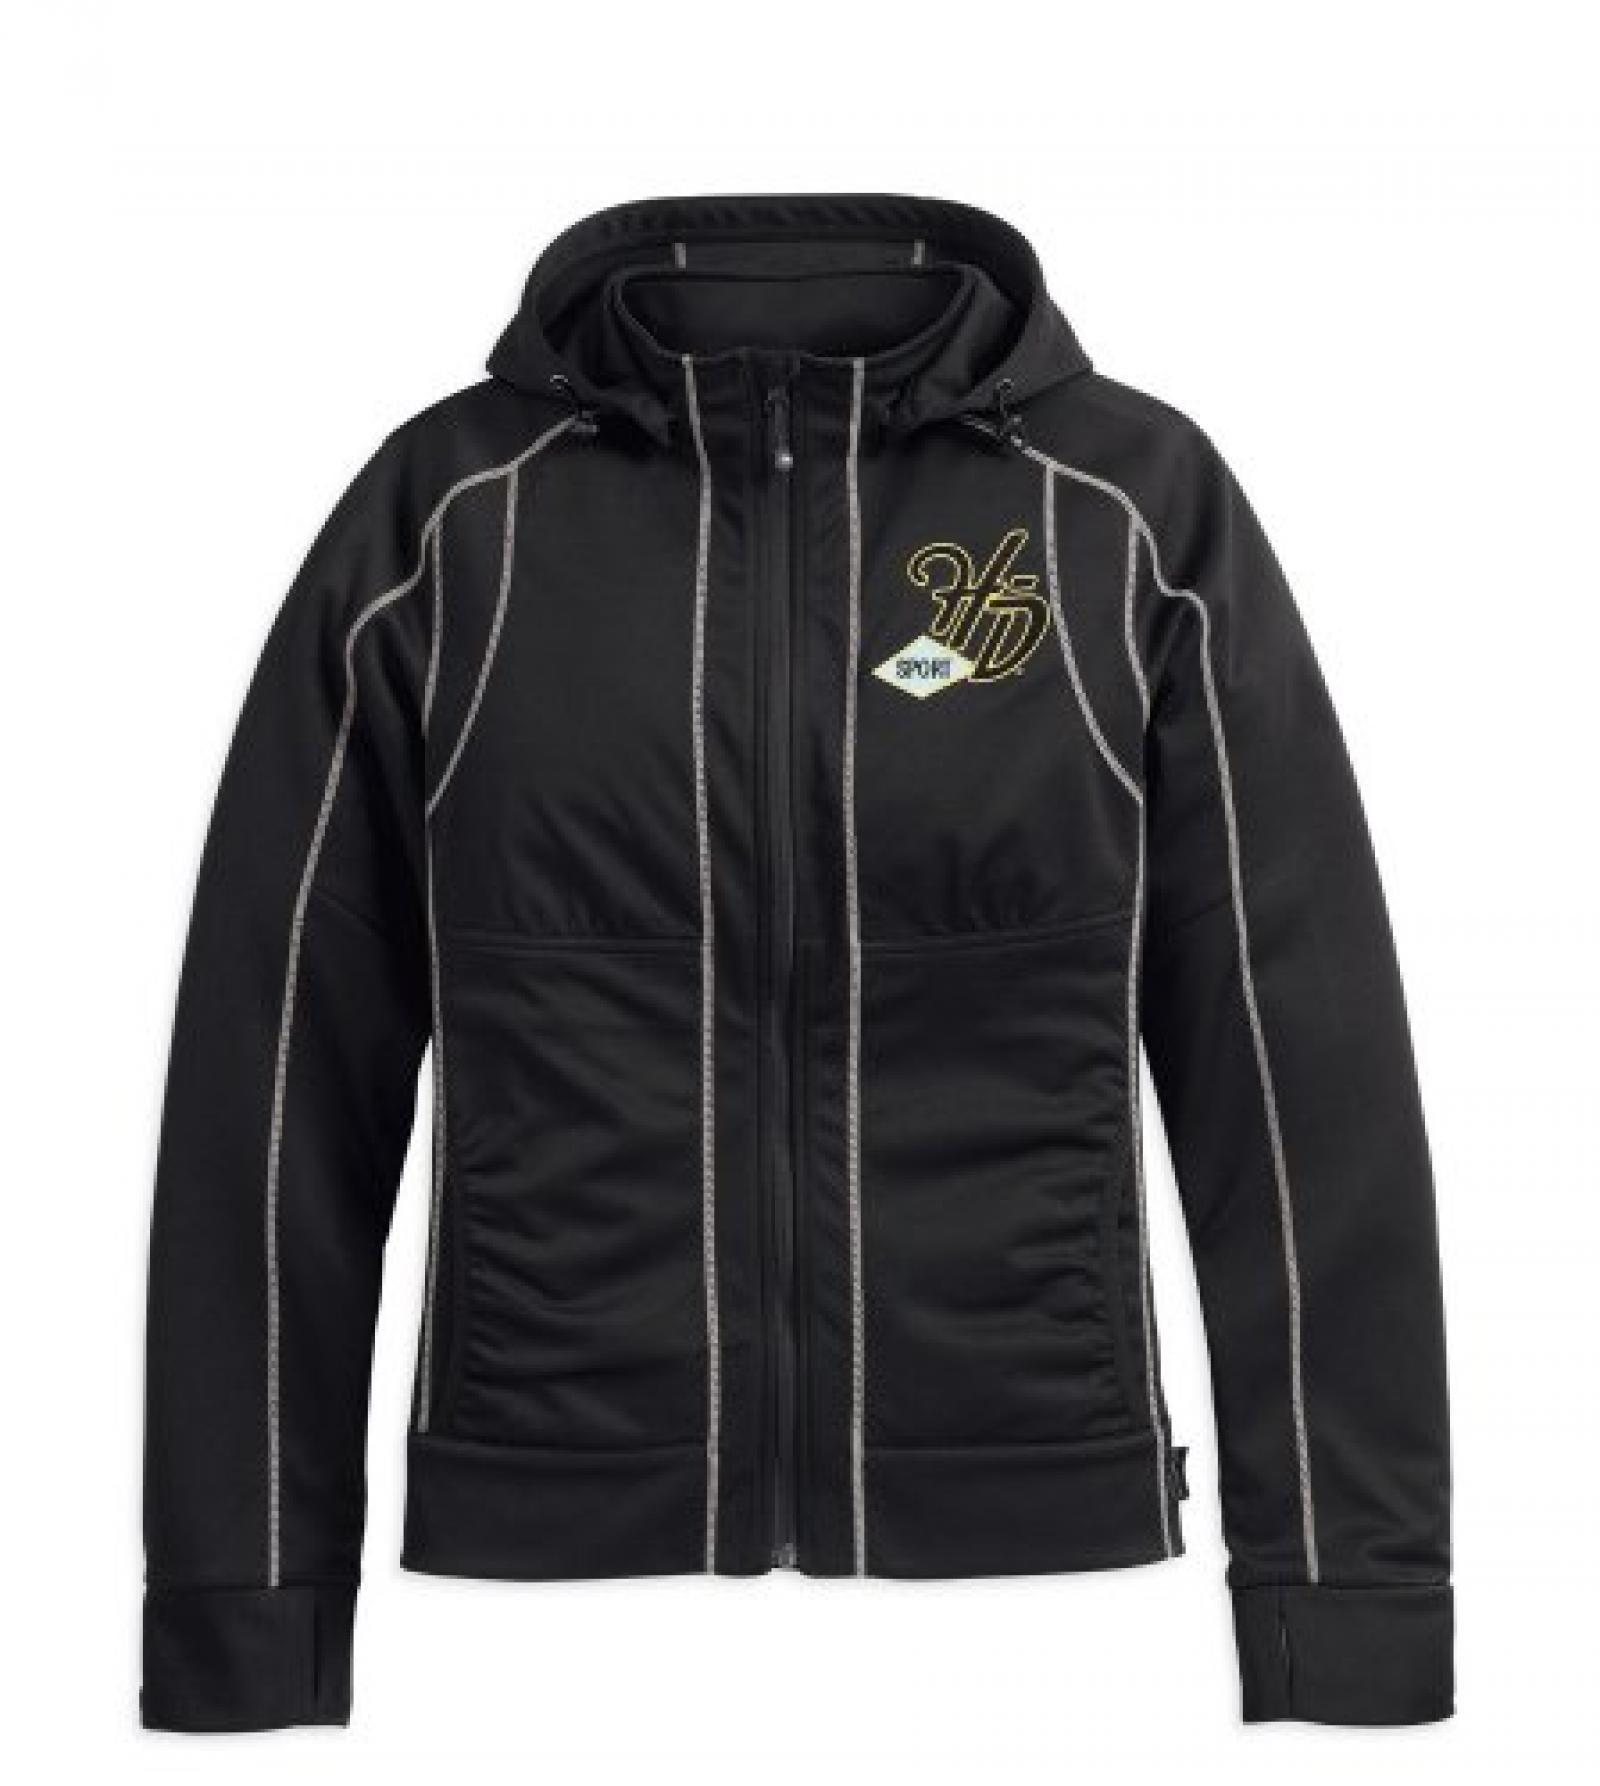 Harley-Davidson Speedway RCS Windproof Soft Shell Jacket 97377-13VW Damen Outerwear